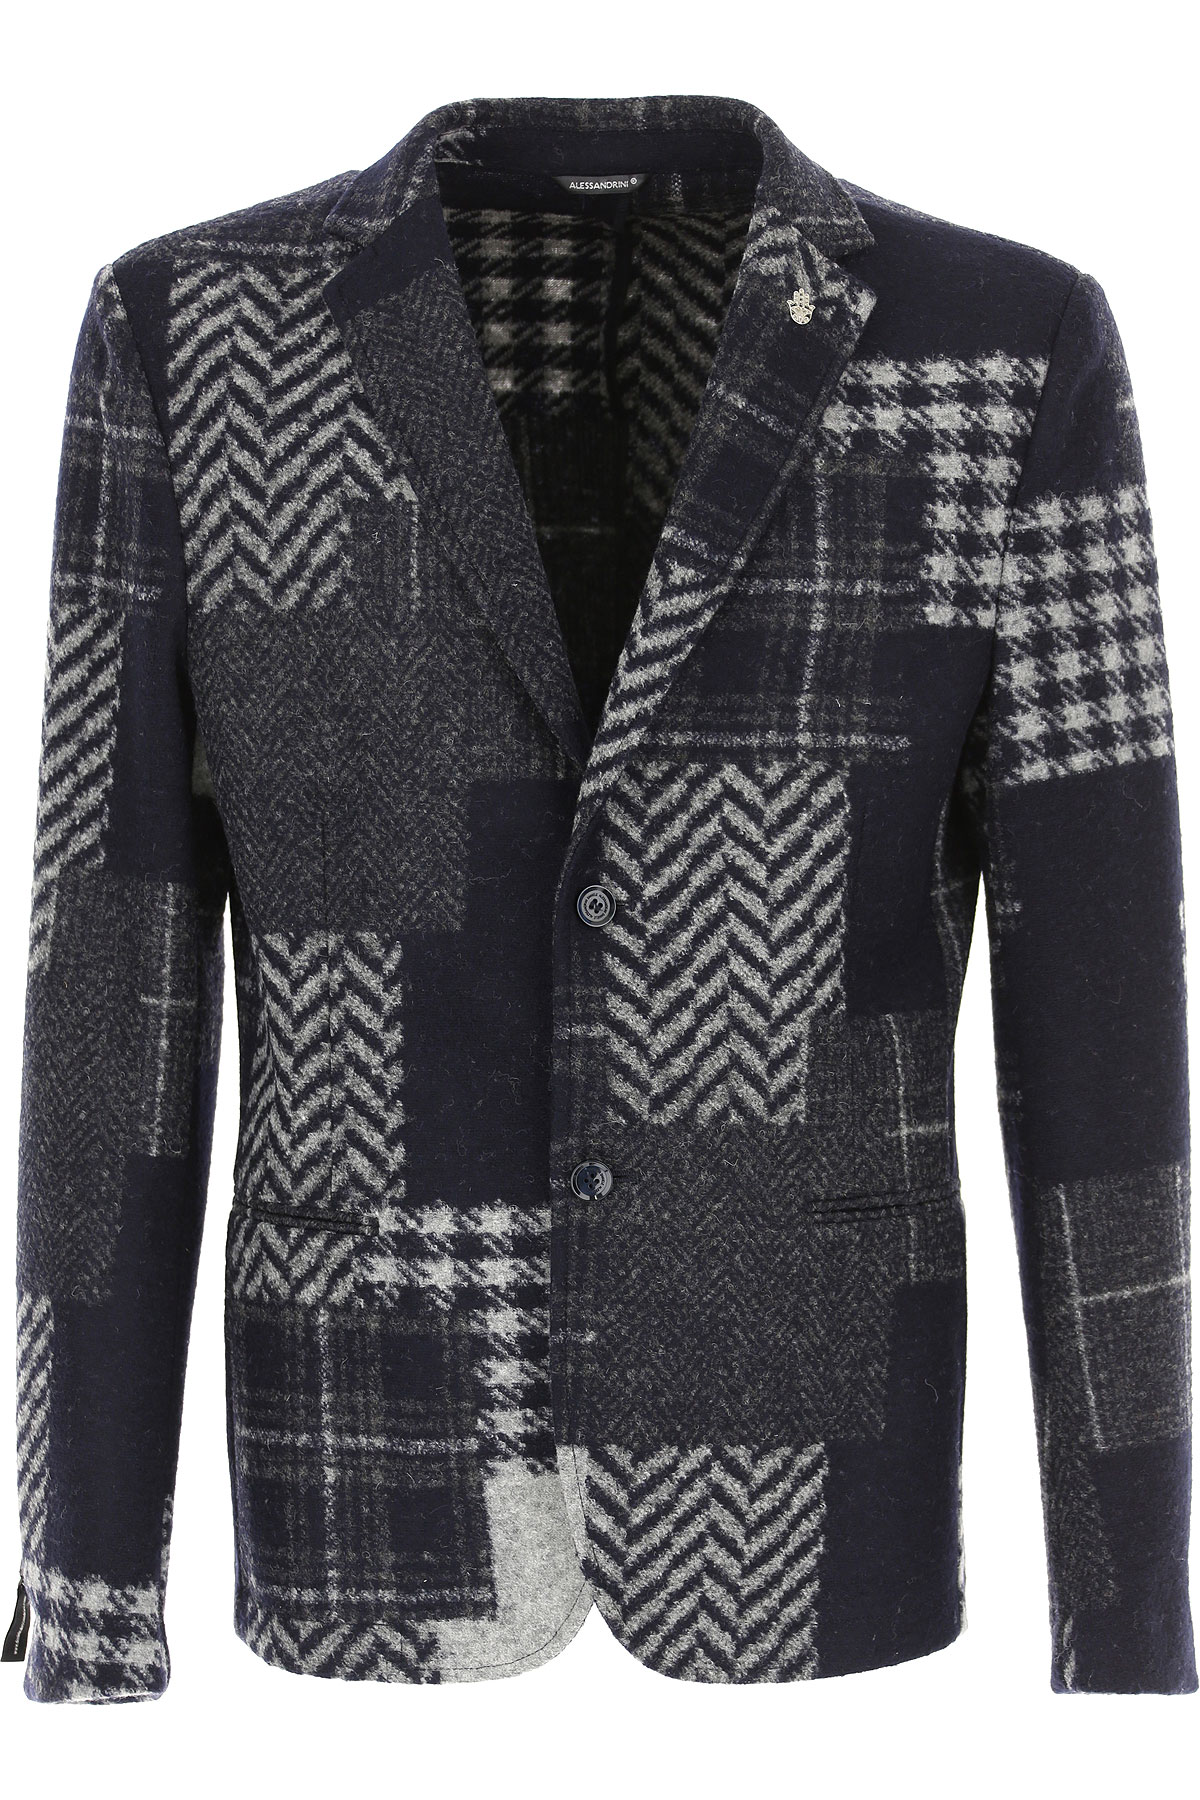 Daniele Alessandrini Blazer for Men, Sport Coat On Sale, Navy Blue, Acrylic, 2019, M S XL XXL